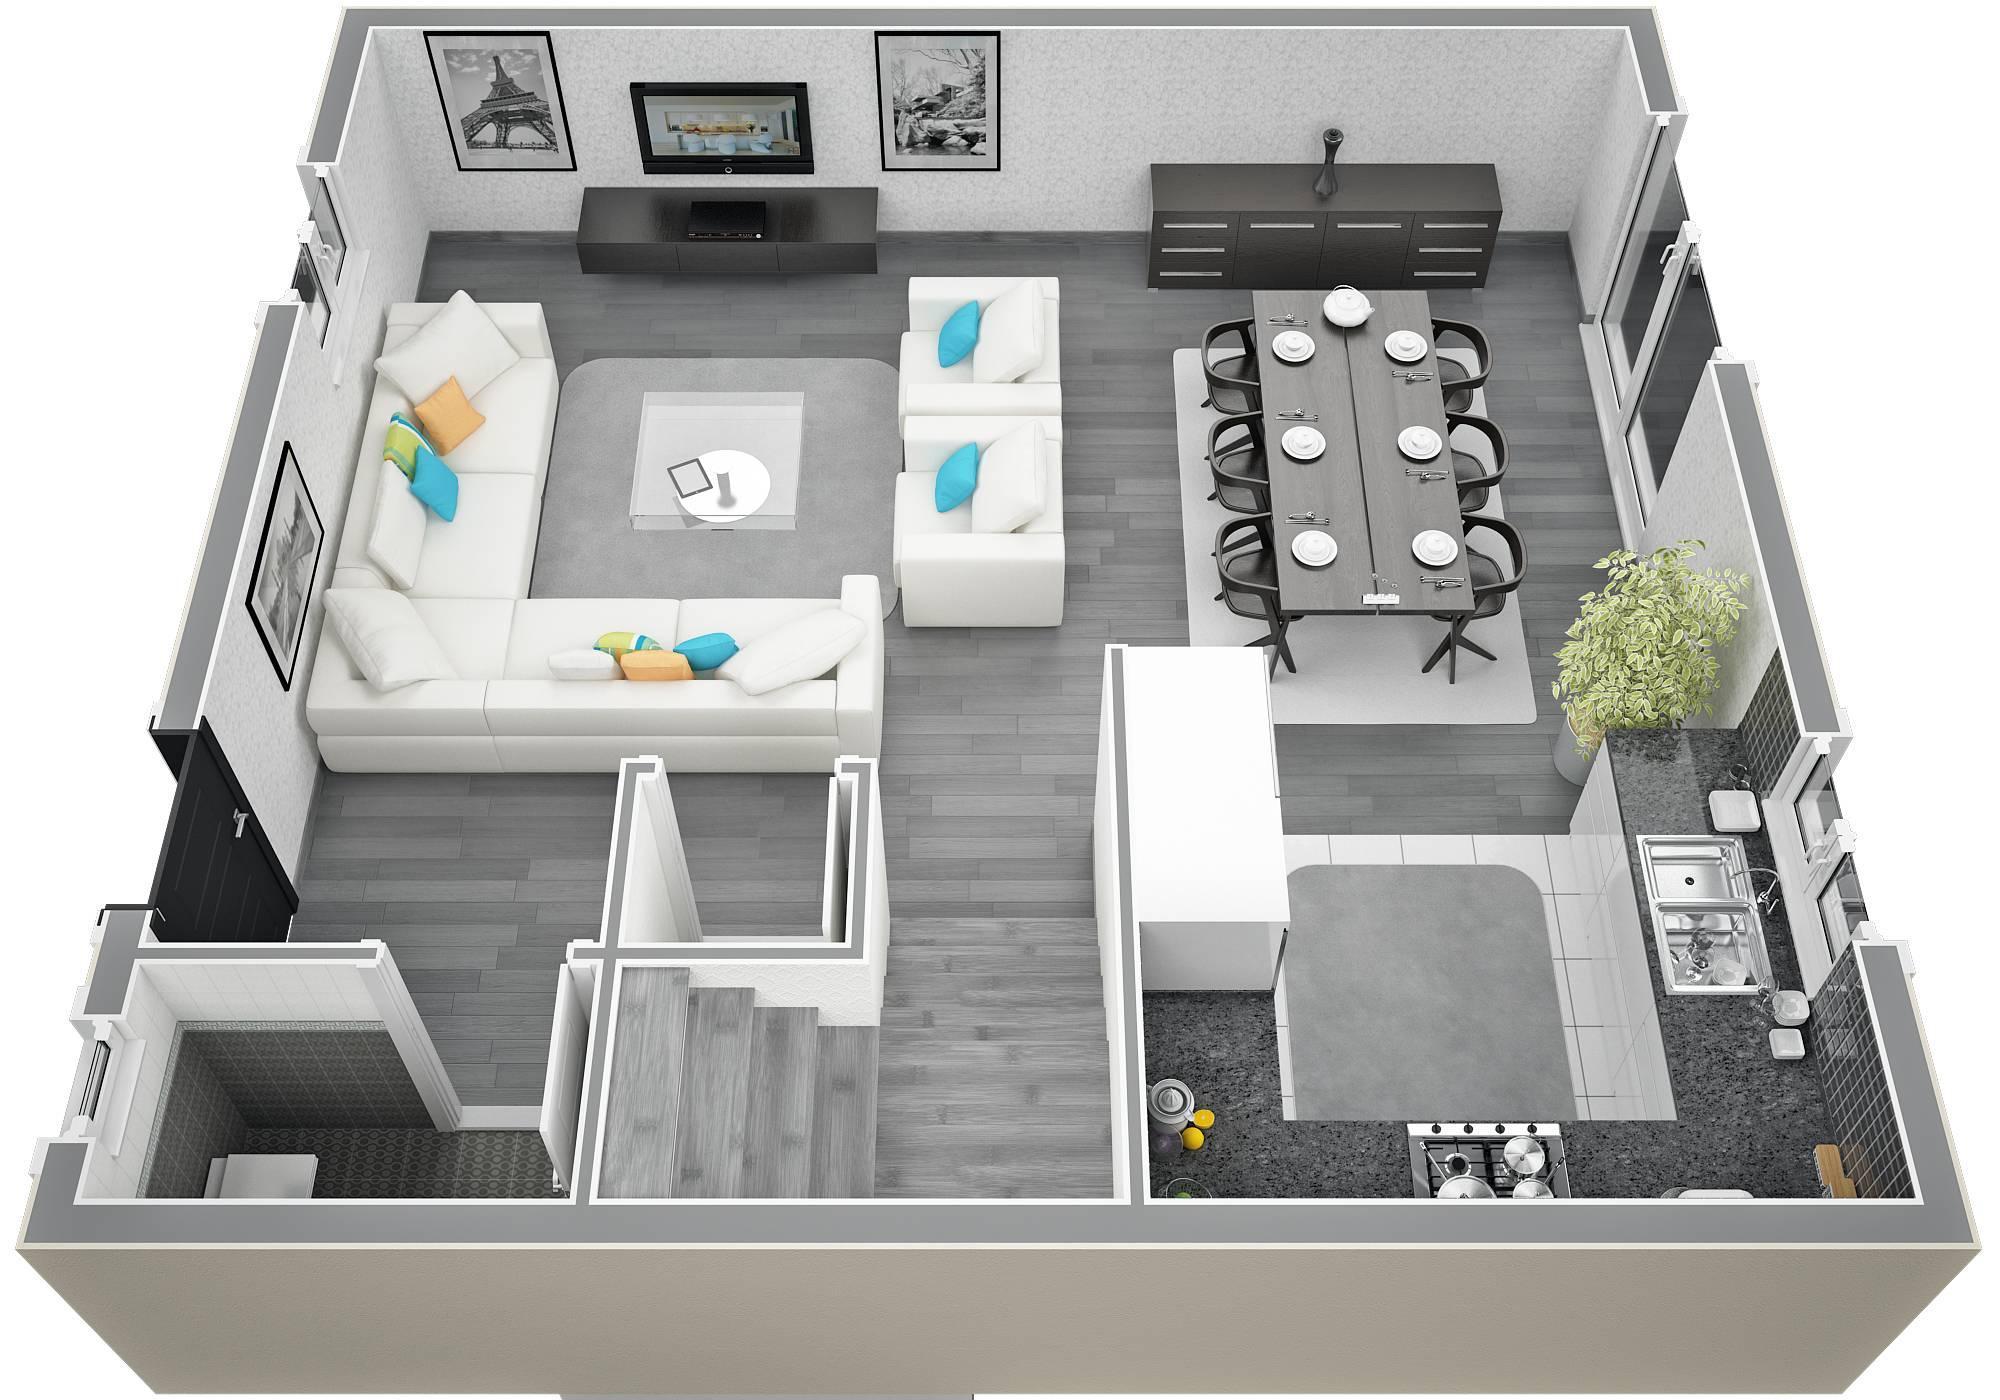 Plan Maison 100m2 : Maison moderne sweet home d